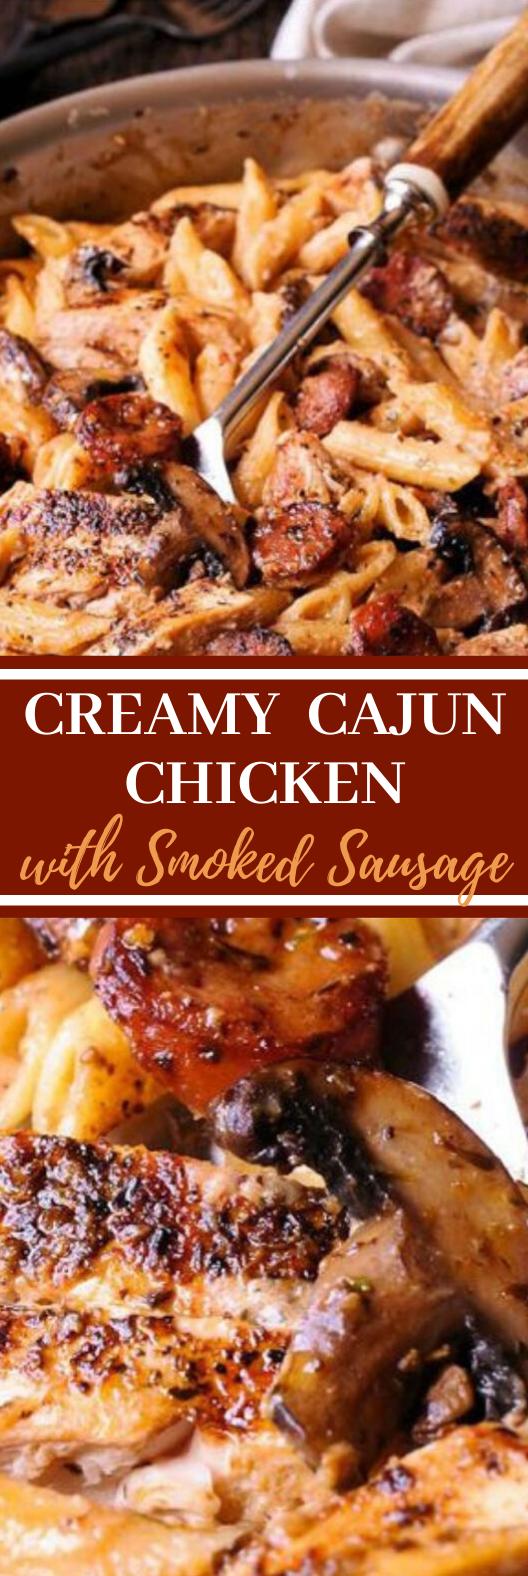 Creamy Cajun Chicken and Sausage Pasta #dinner #pasta #comfortfood #easy #recipes